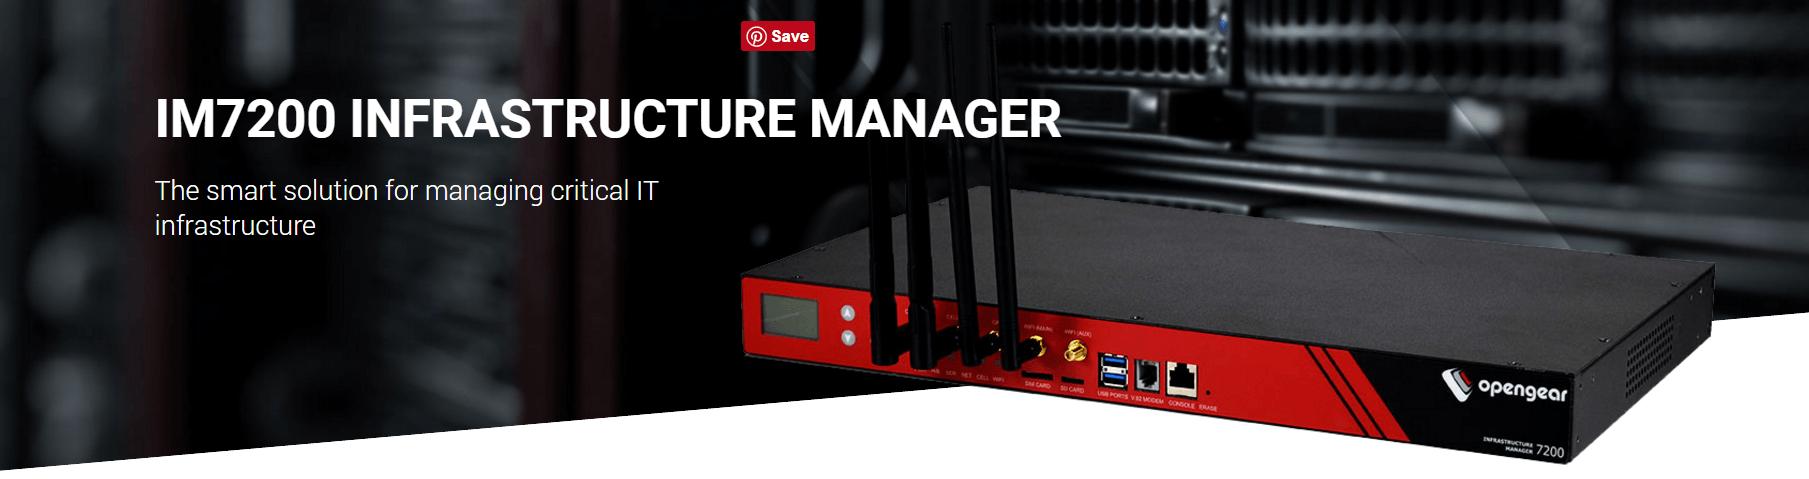 opengear-data-center-management-im7200-infrastructure-manager